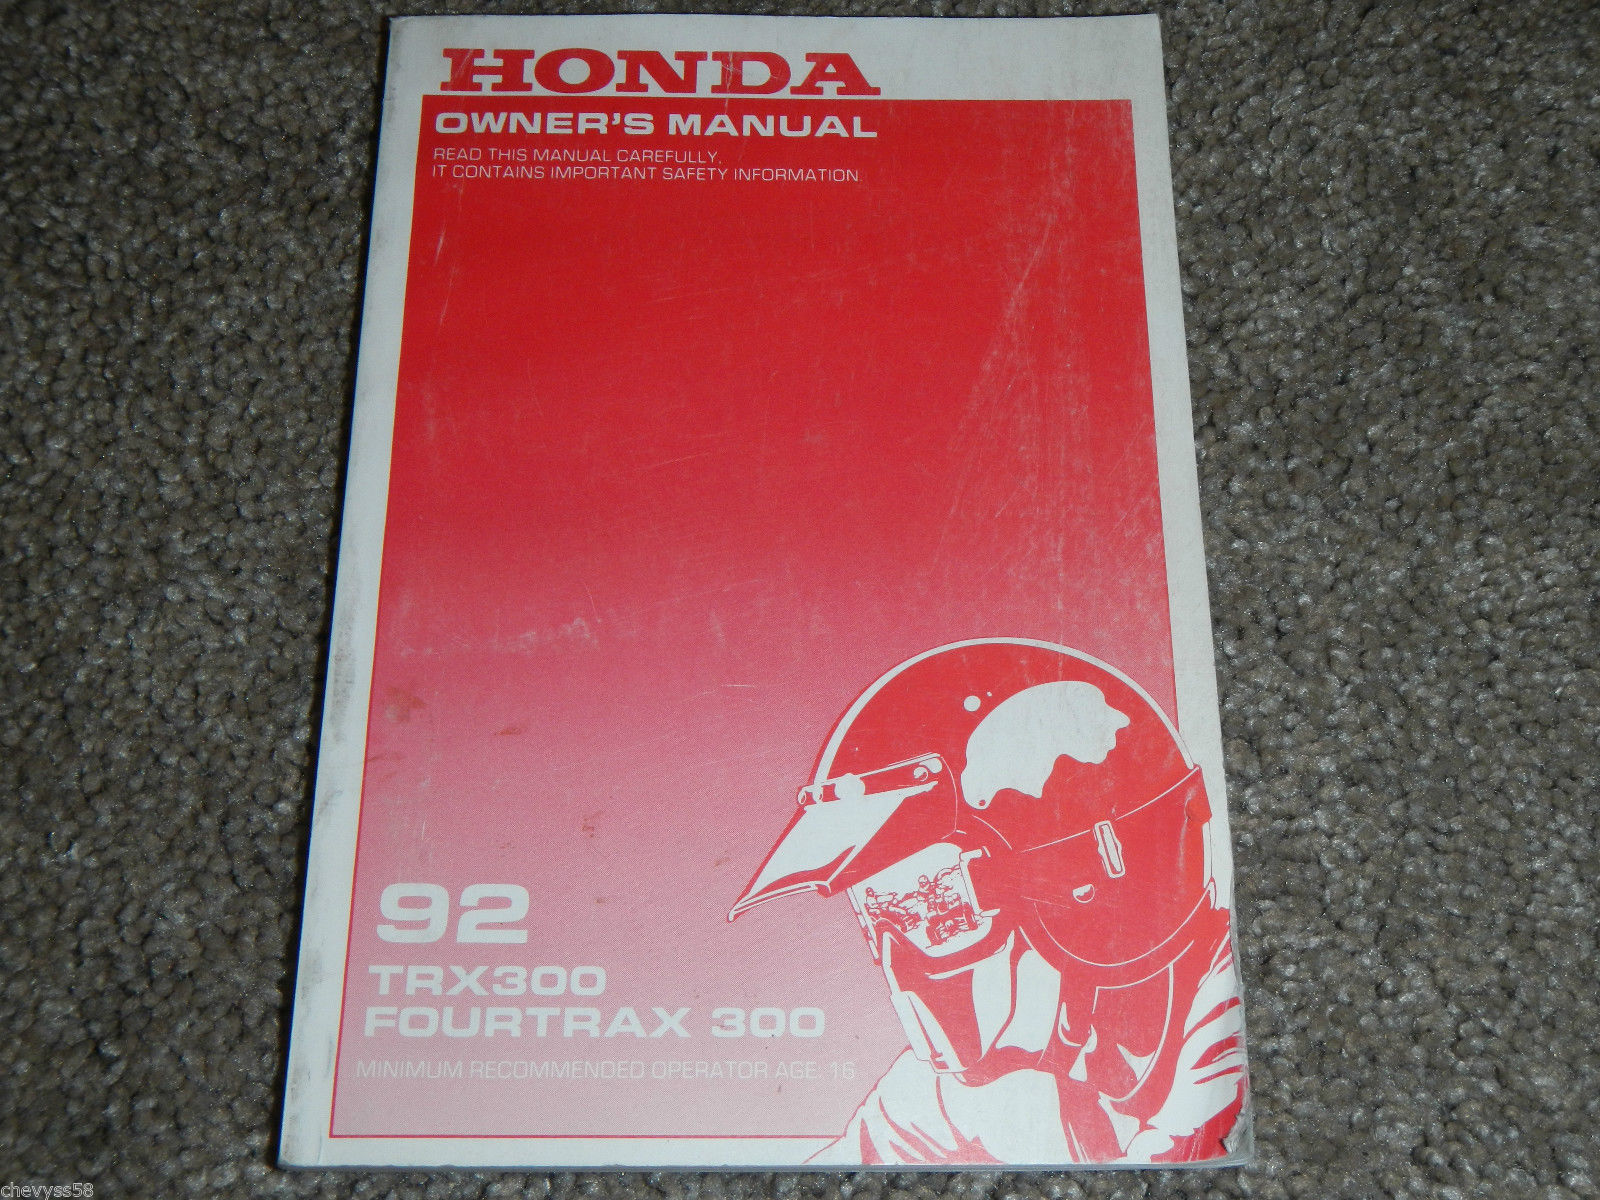 1992 92 HONDA TRX300 TRX 300 FOURTRAX OWNER OWNERS OWNER'S MANUAL